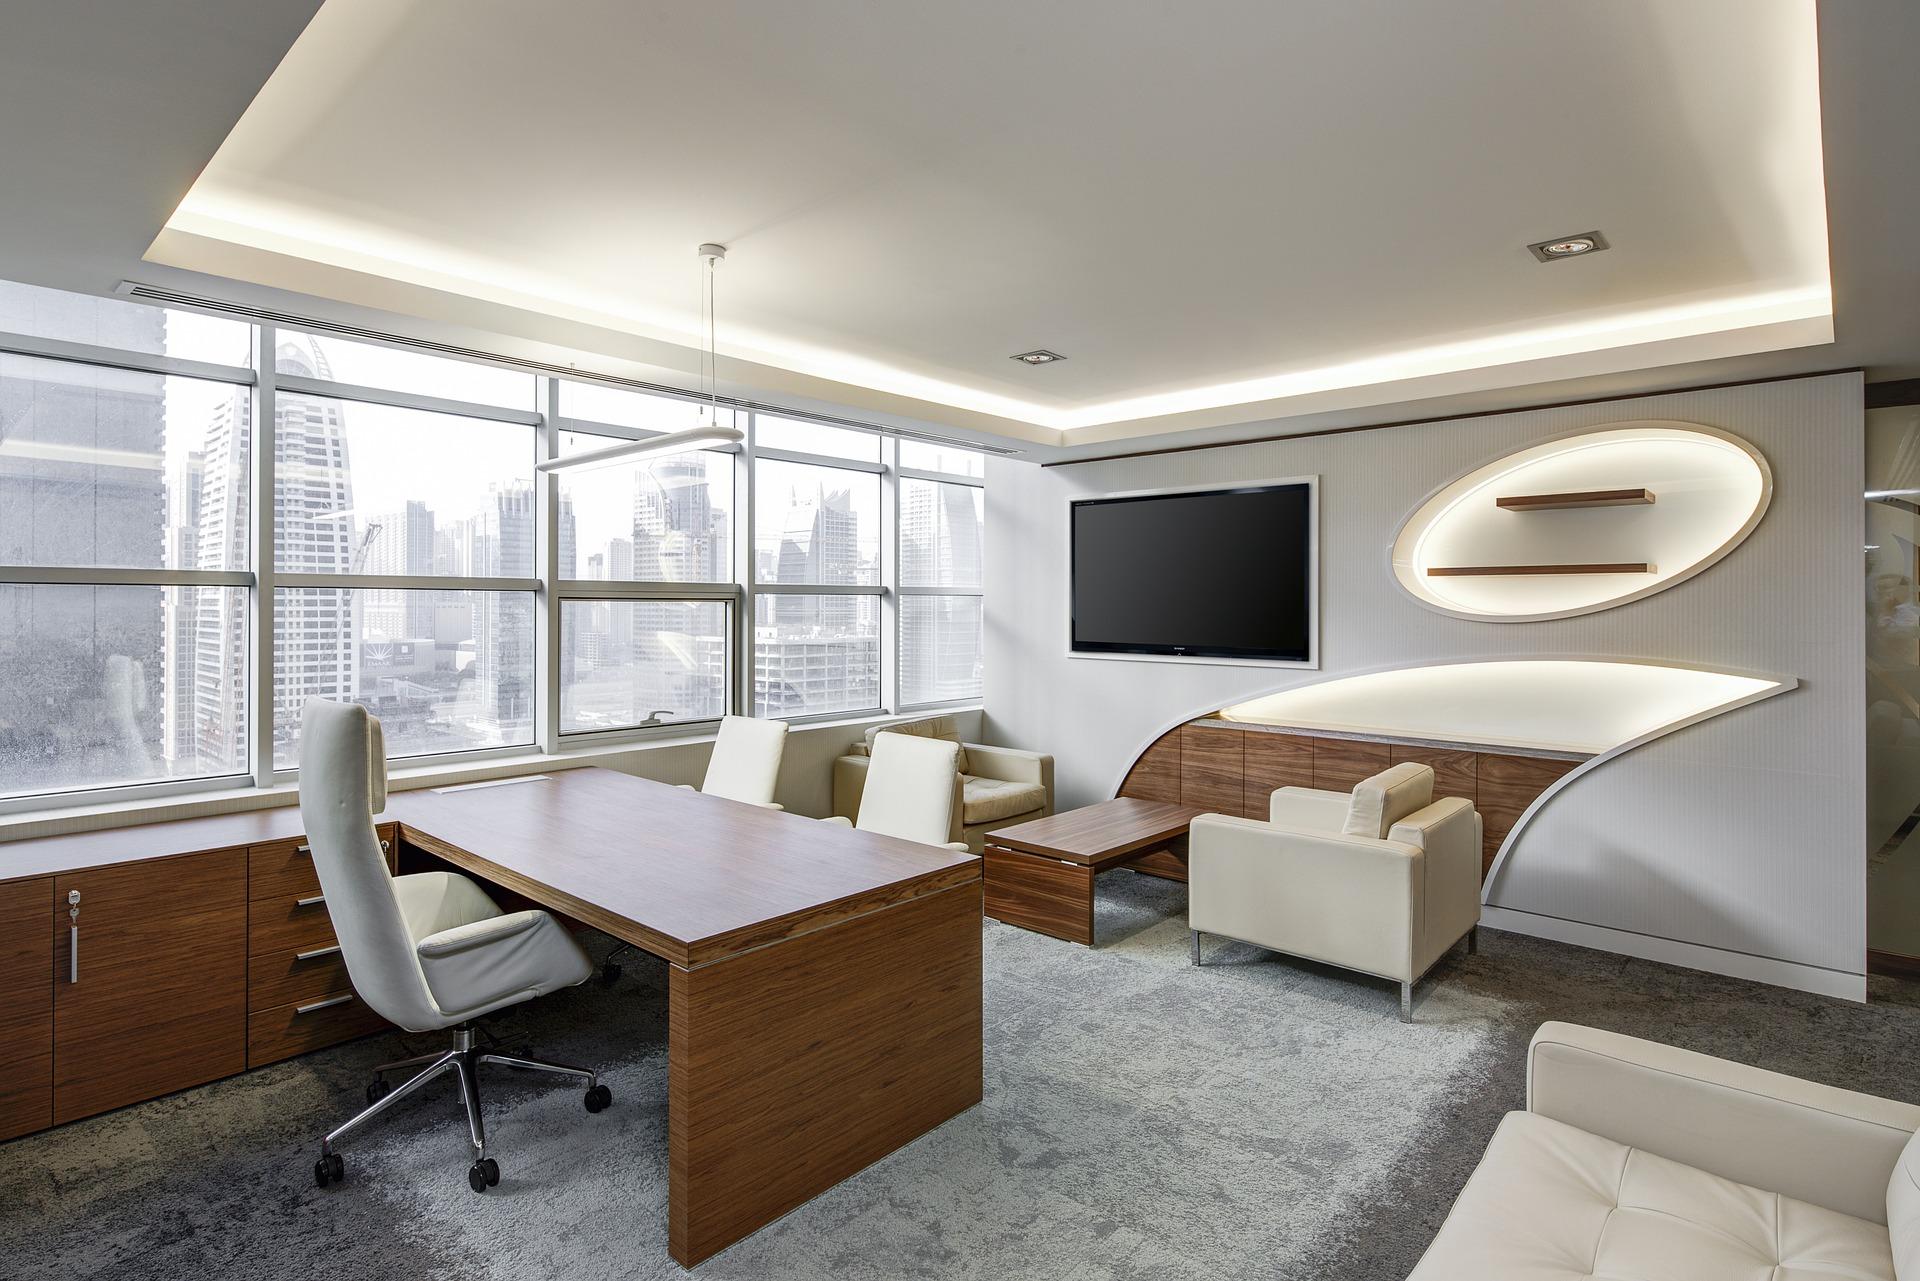 Fibo Office